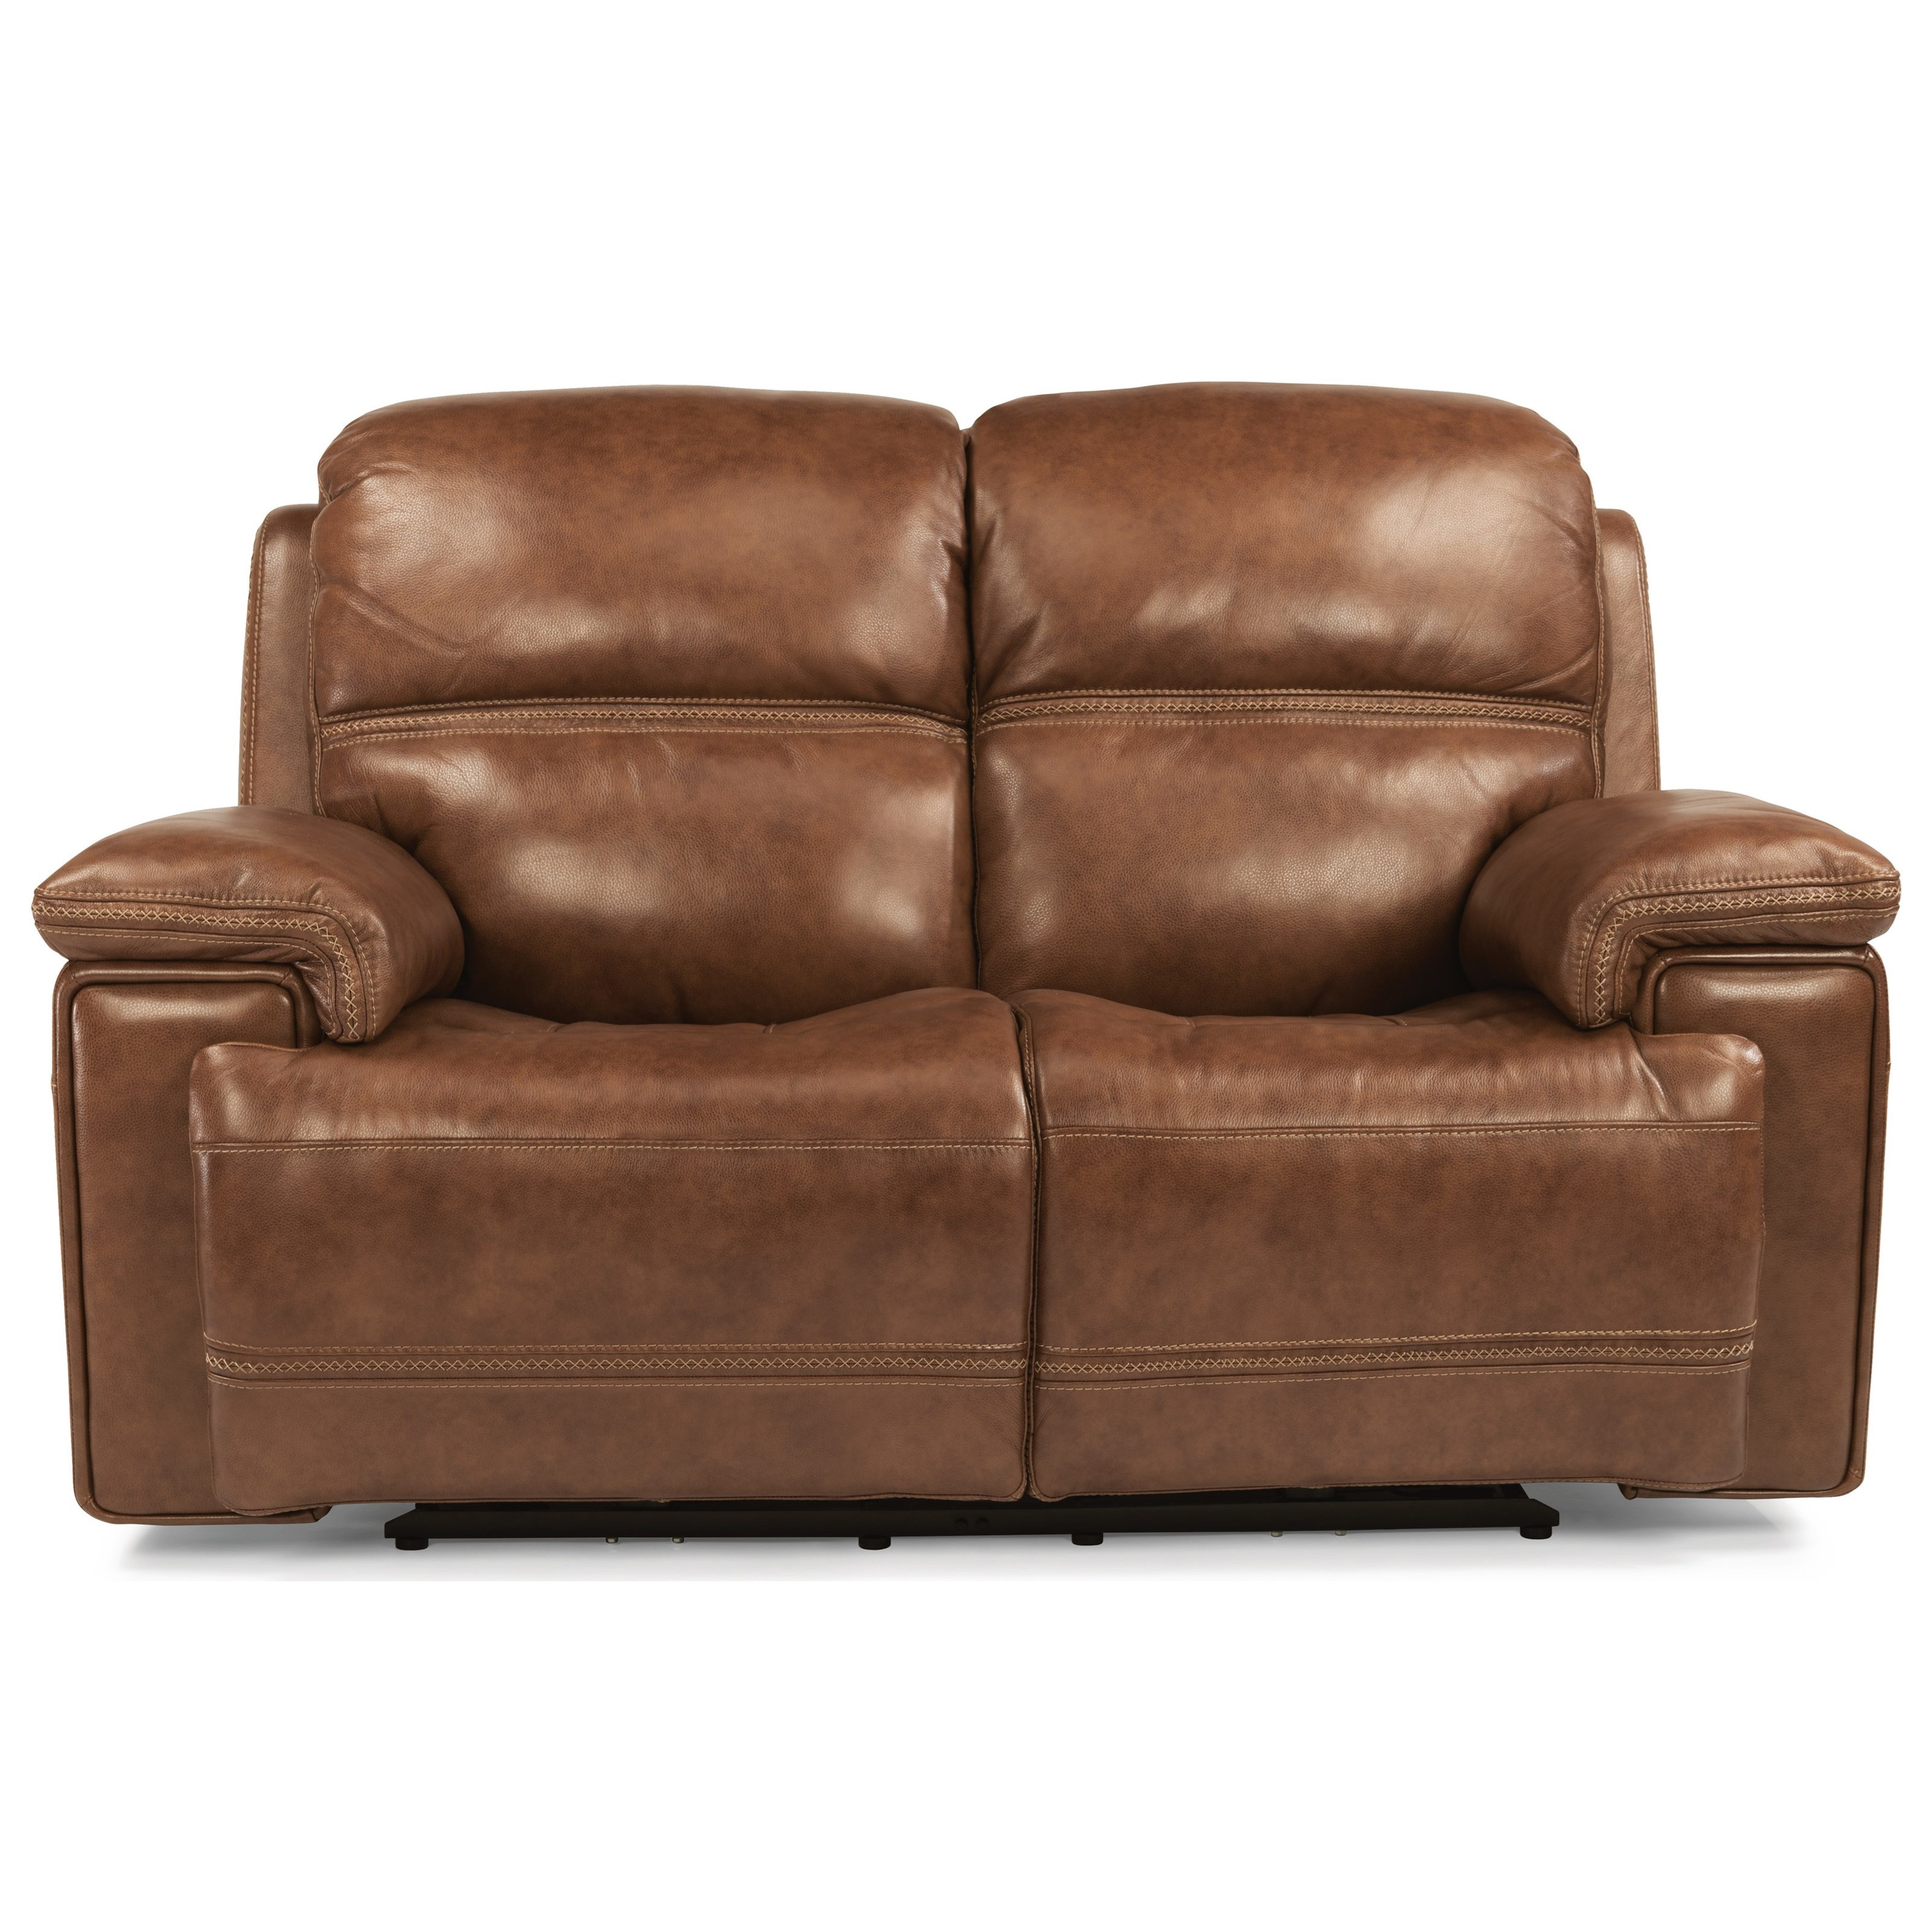 Latitudes-Fenwick Pwr Rcl Loveseat w/ Pwr Headrest by Flexsteel at Miller Waldrop Furniture and Decor